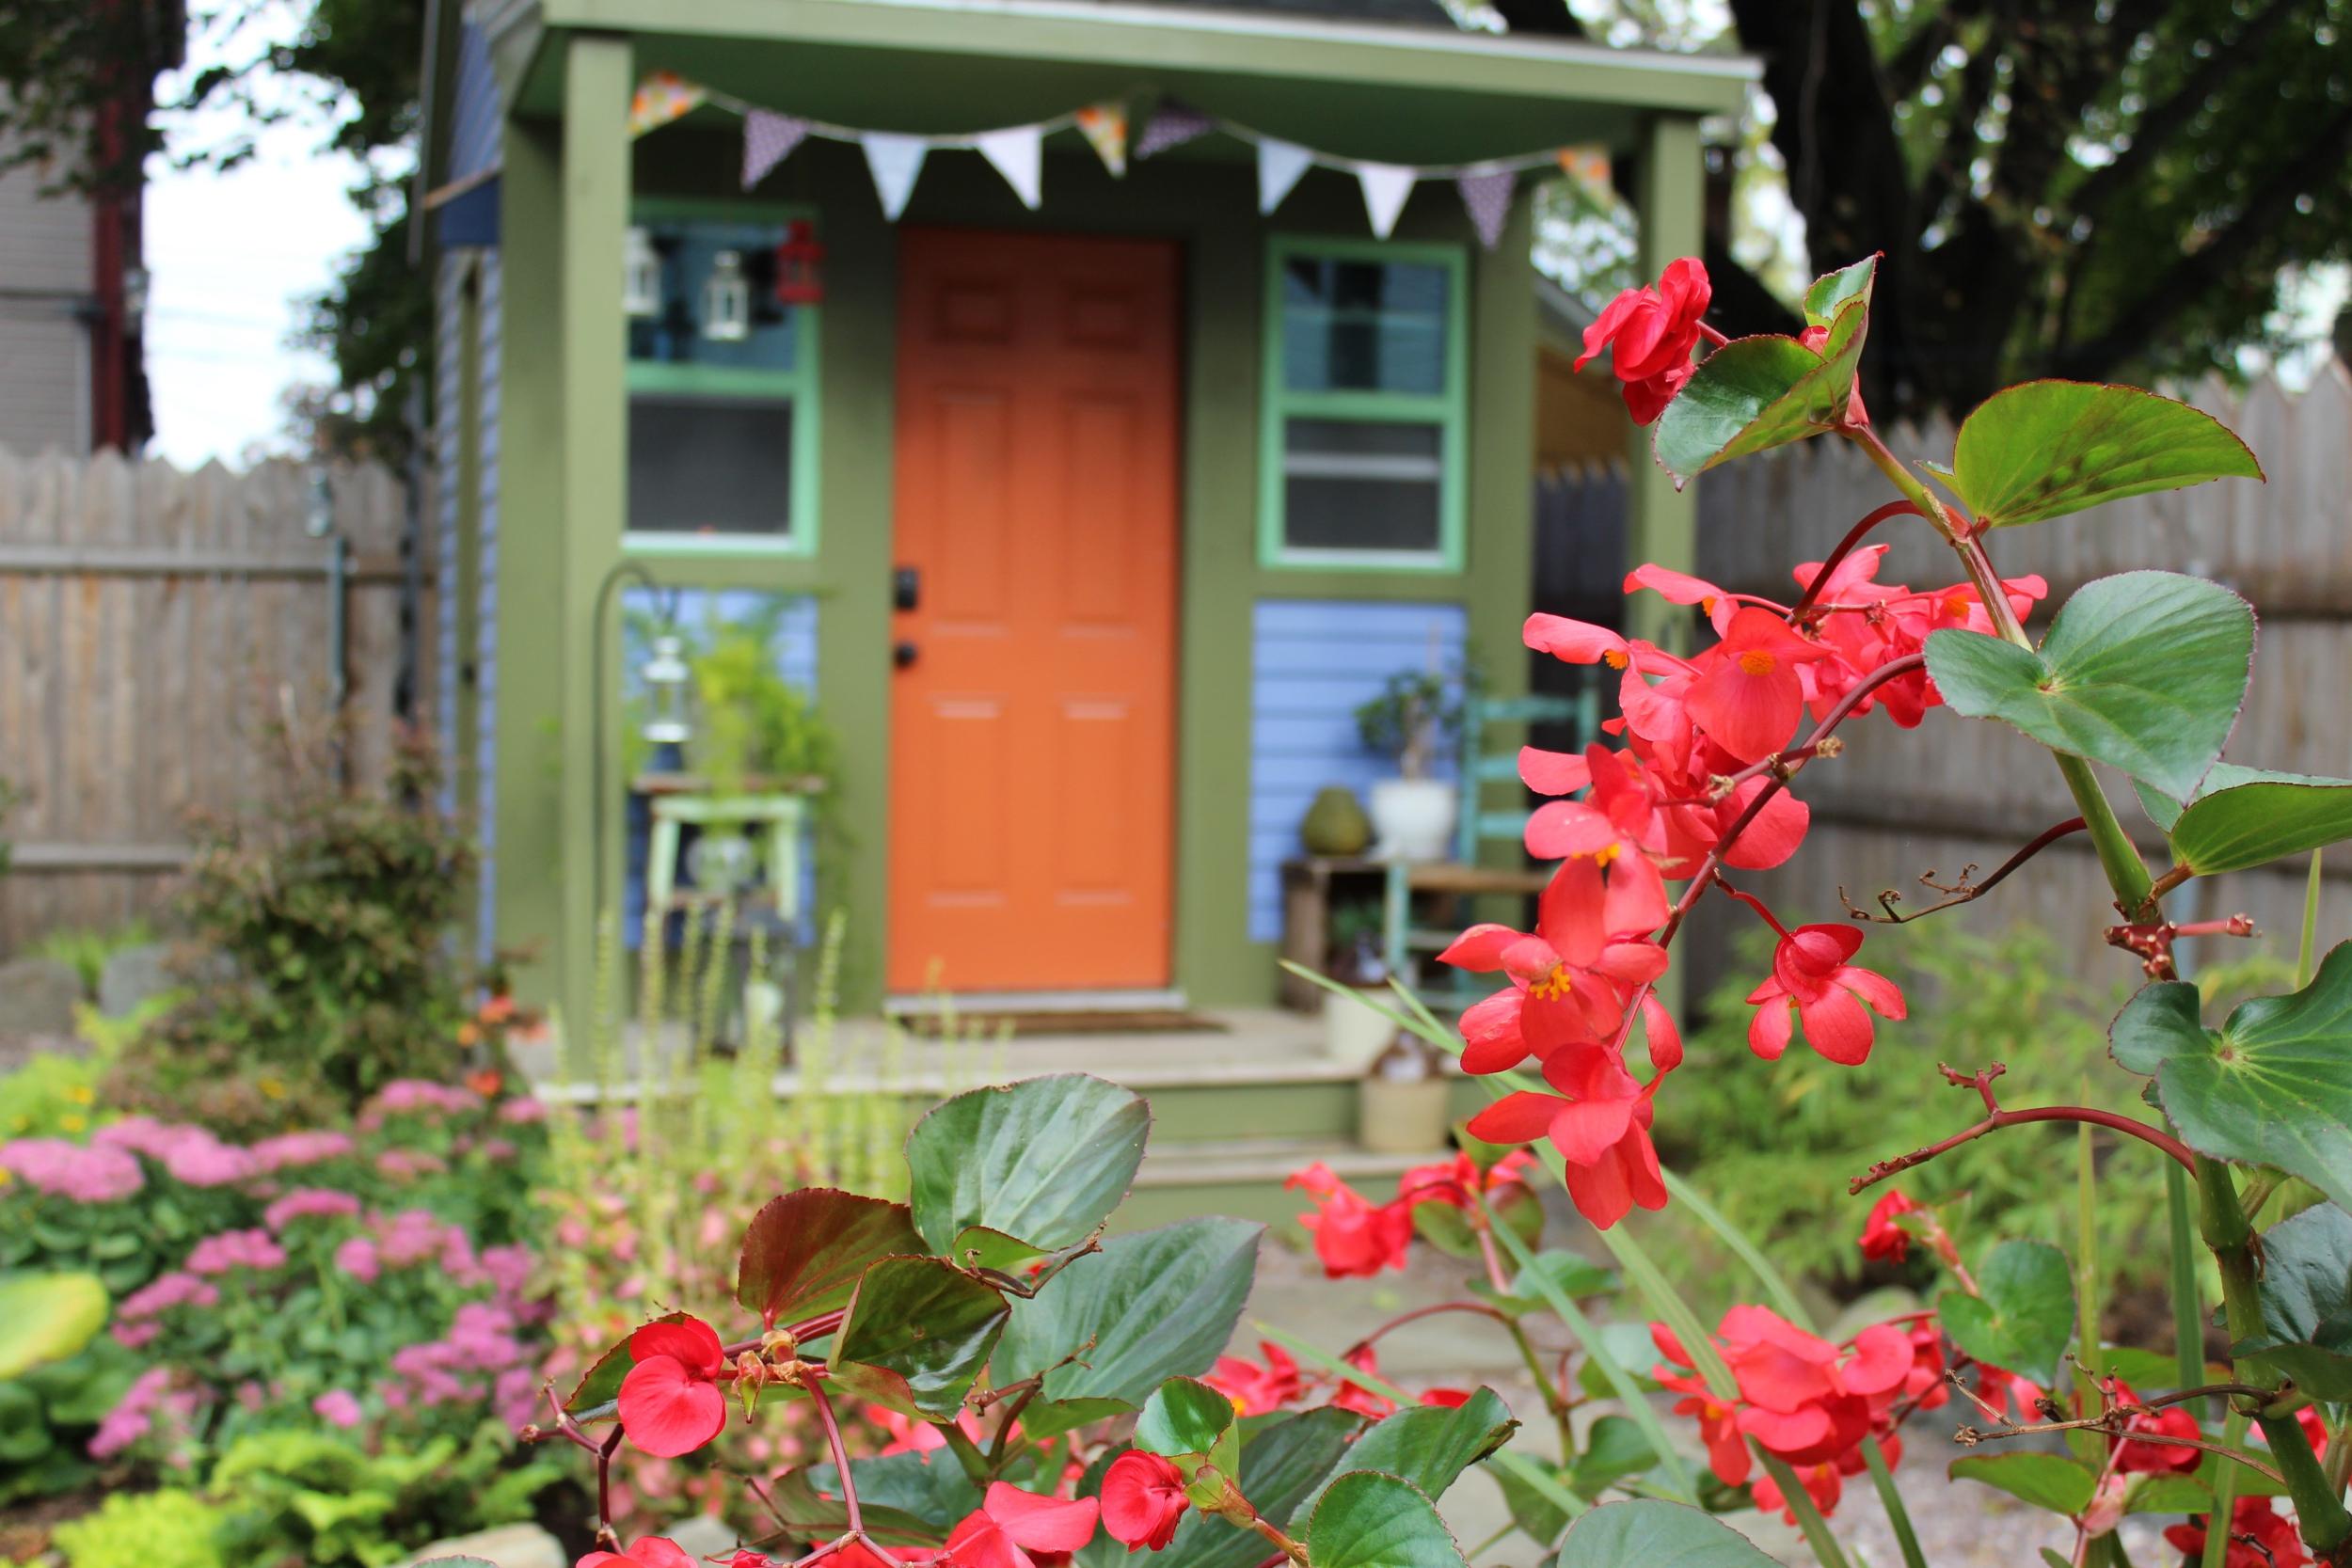 Gardens on Hammond Street Photo by Jessica Jennings